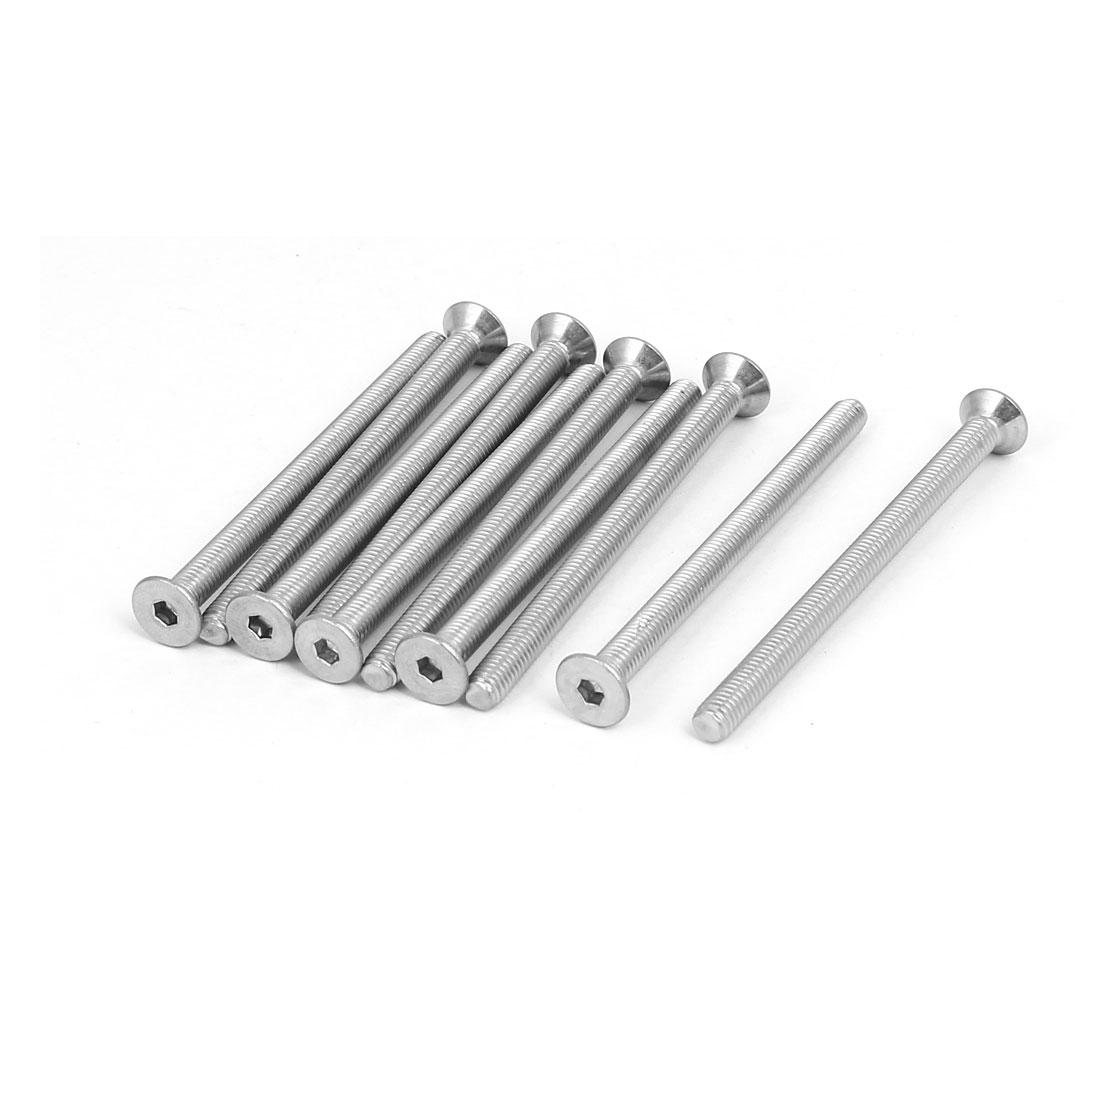 M5x70mm 304 Stainless Steel Flat Head Hex Socket Screws Fastener DIN7991 10pcs